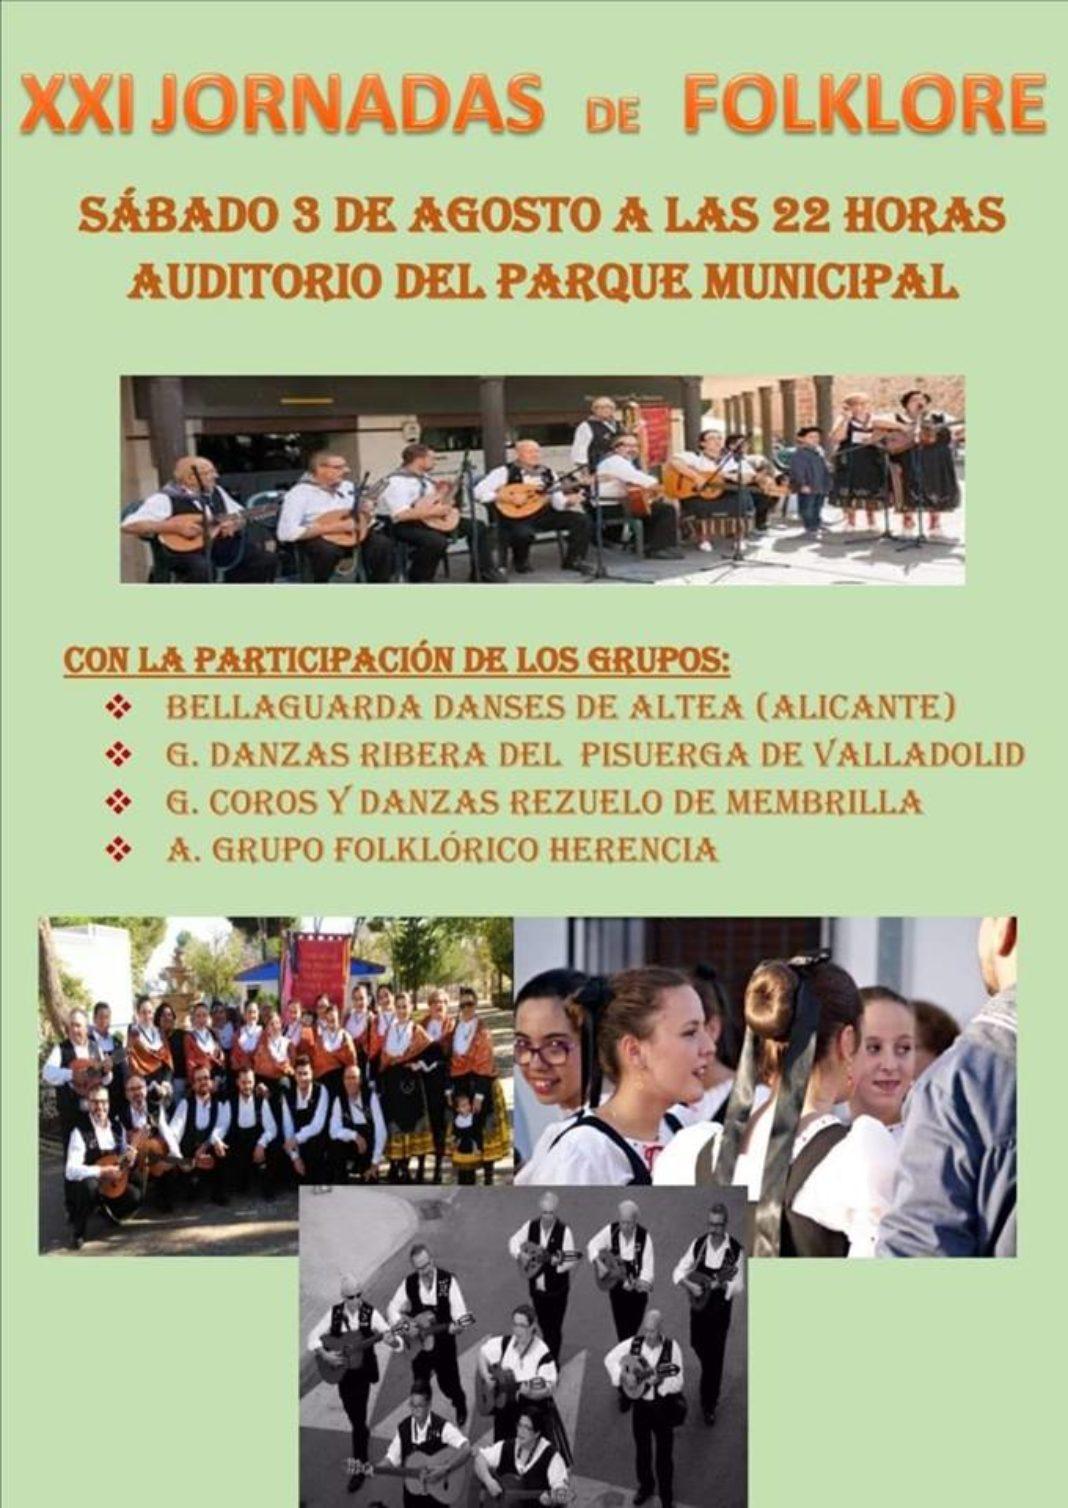 XXI Jornadas de folclore de Herencia 1068x1508 - Herencia acoge sus XXI Jornadas Nacionales de Folclore